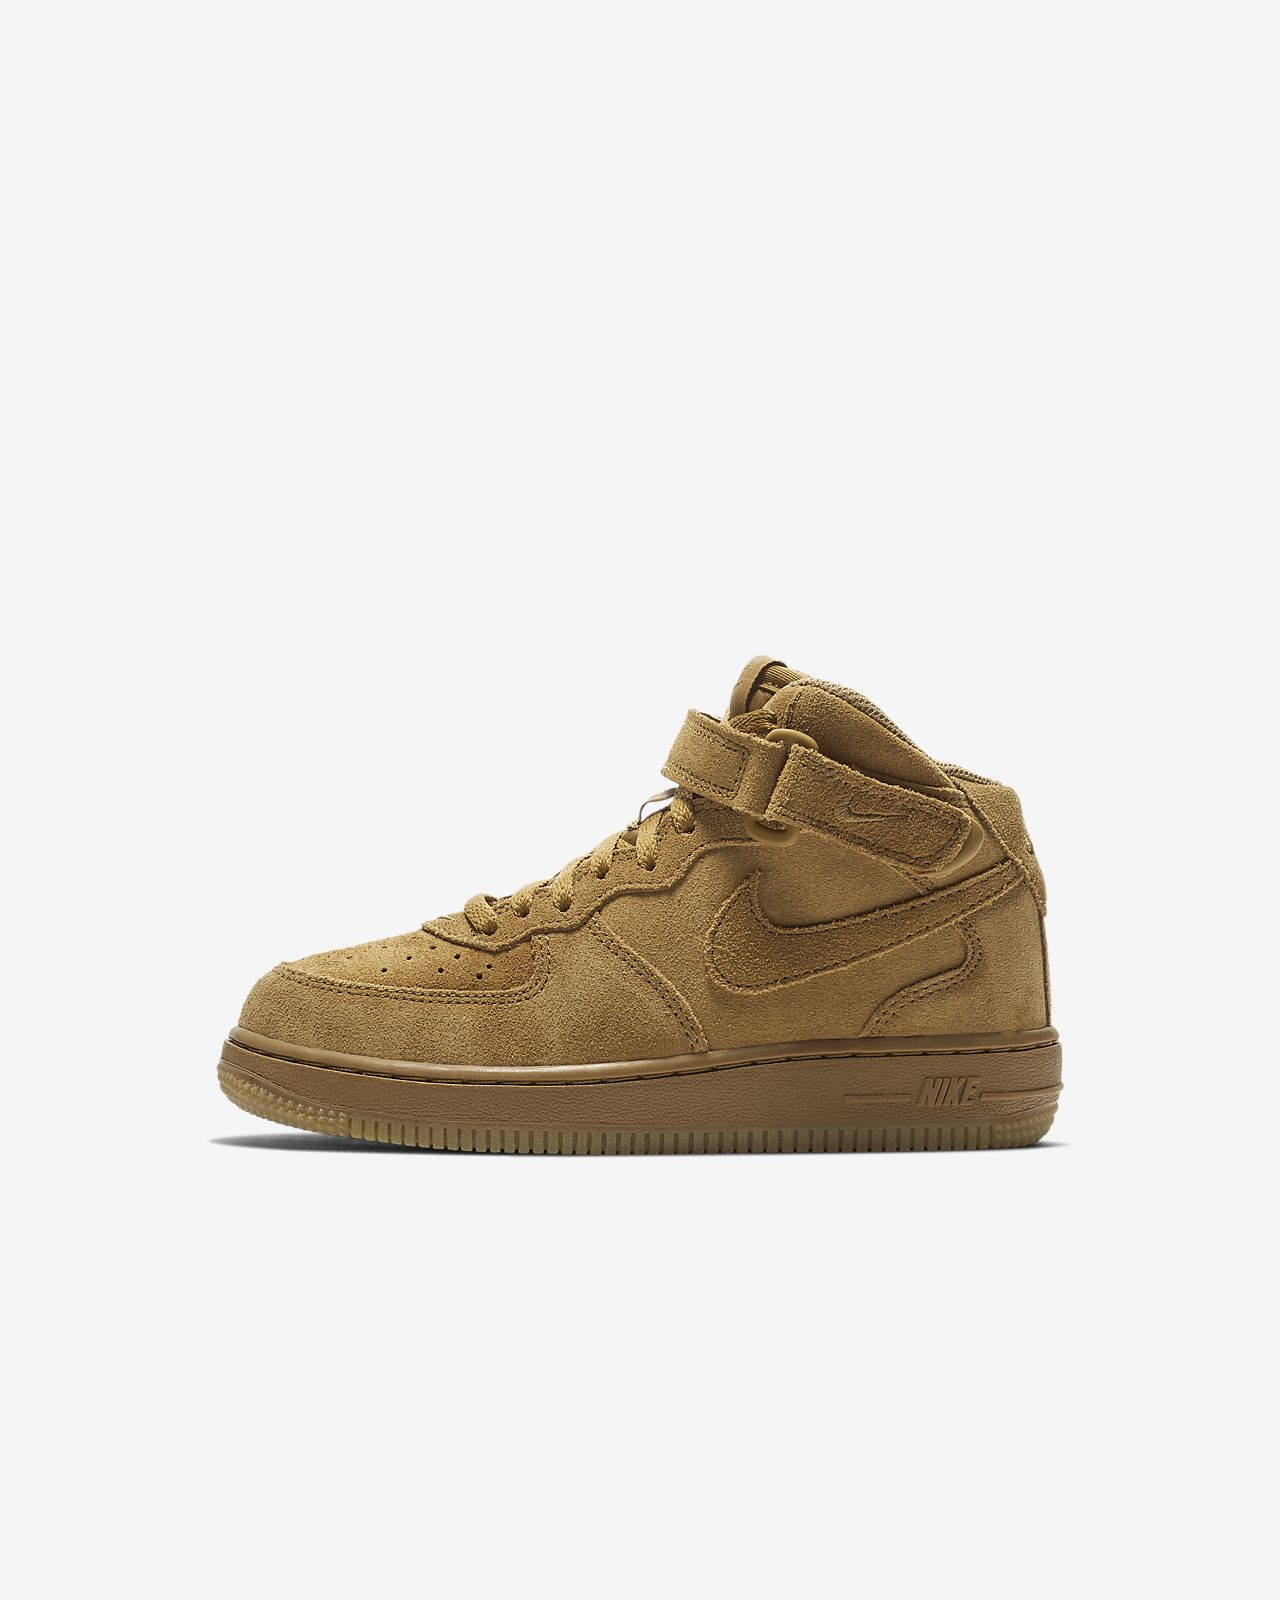 Nike Air Force 1 Mid LV8 Schuh für jüngere Kinder